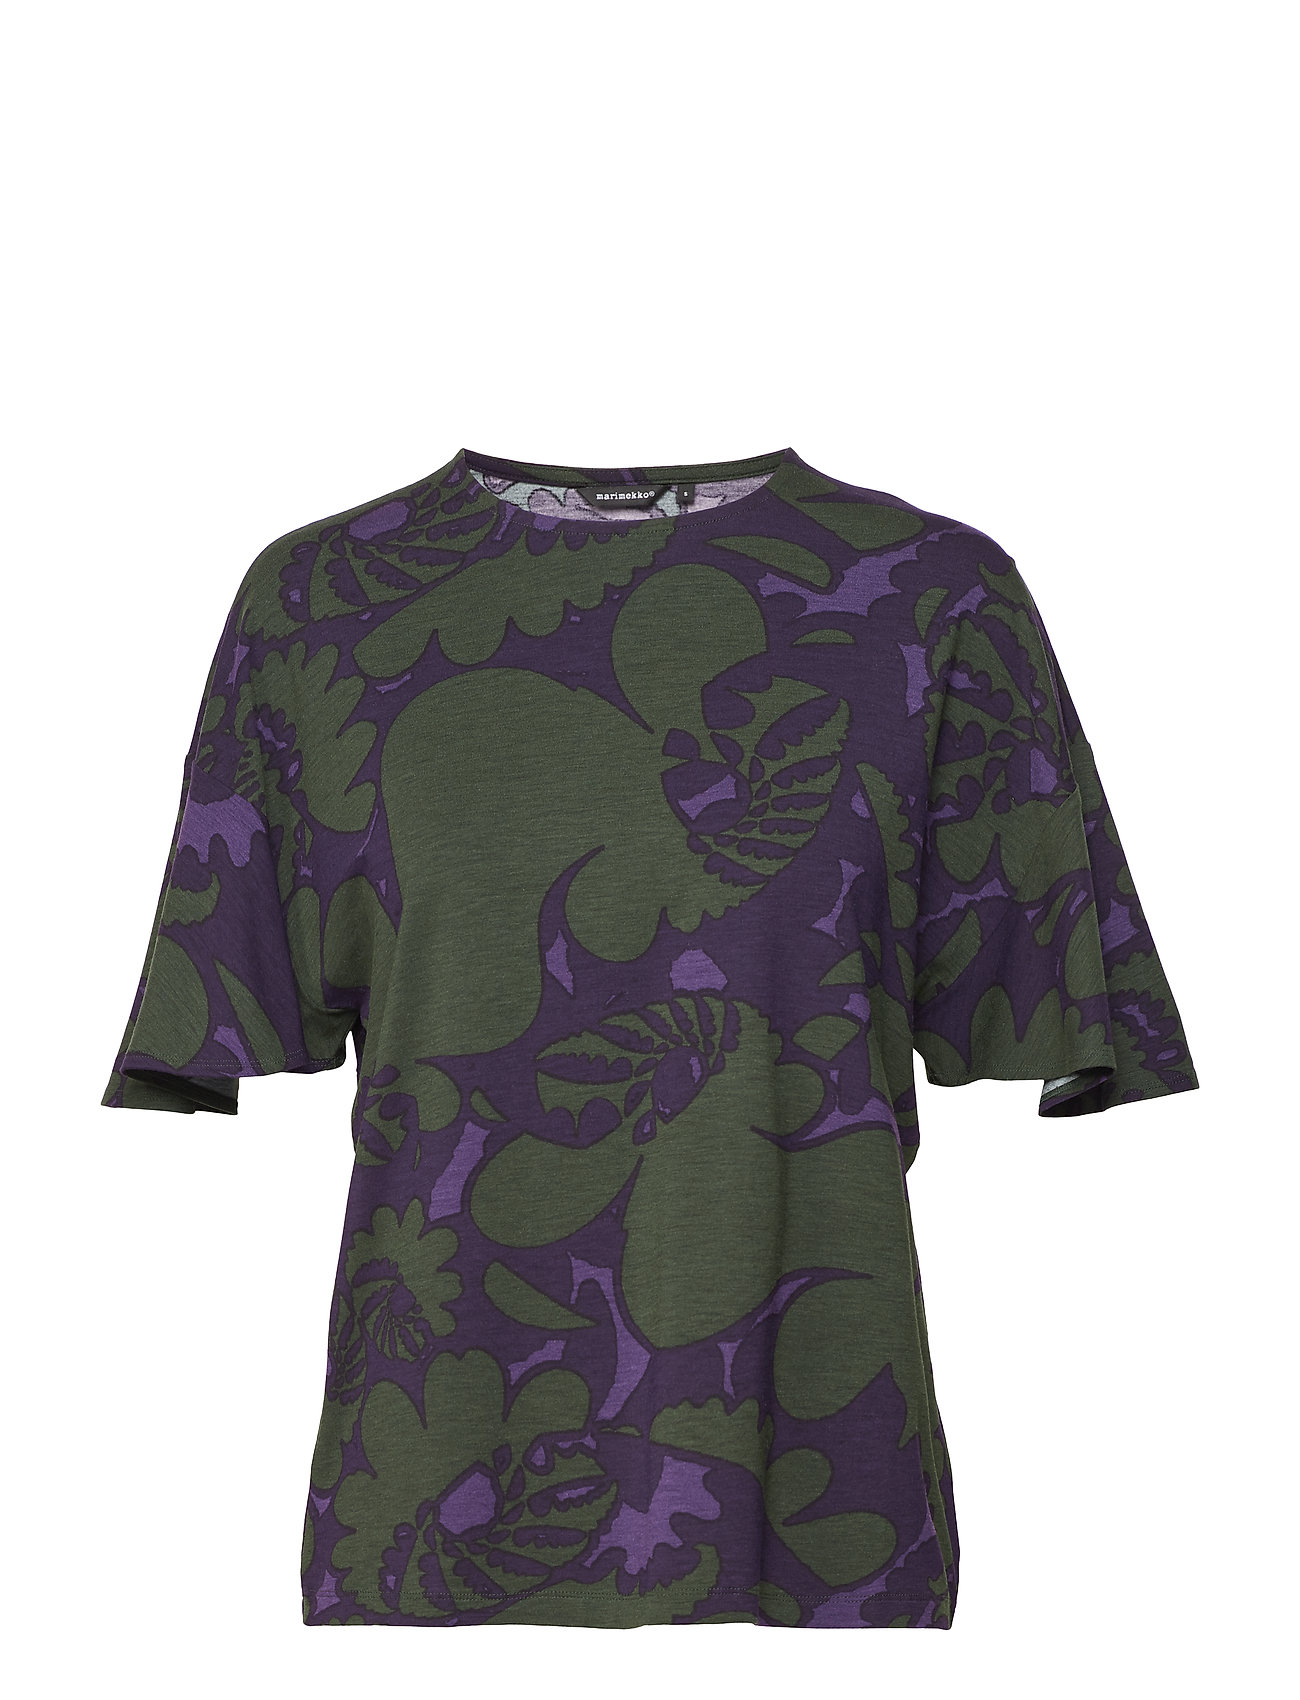 ee5dba611 Marimekko Elre Akileija T-shirt (Purple, Blackberry, Green), (62.50 ...